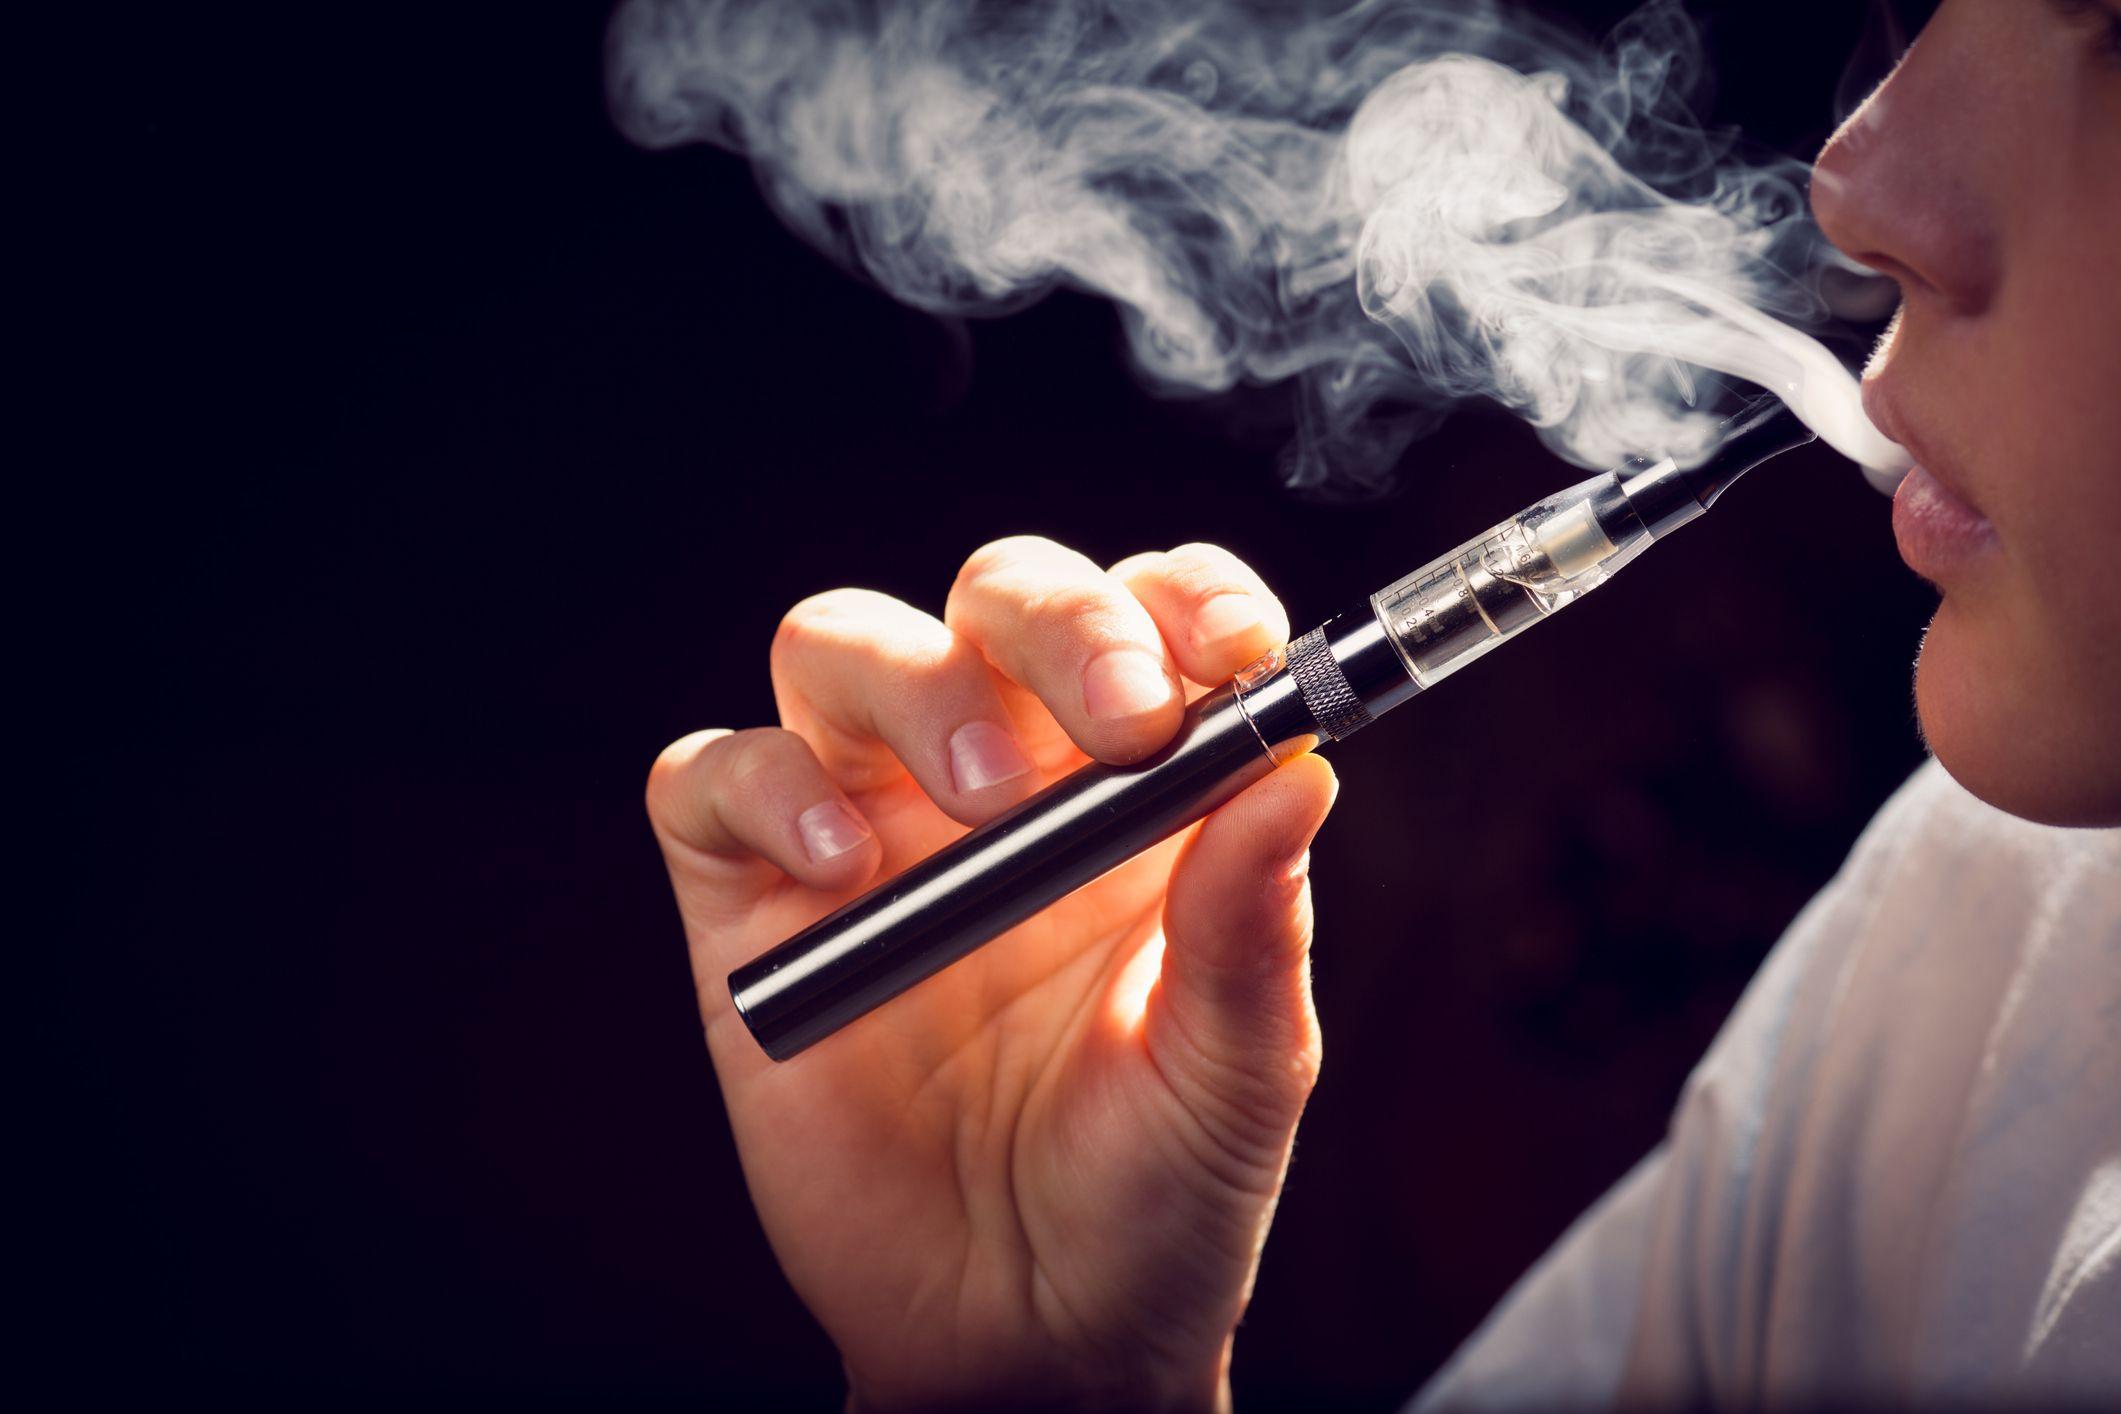 vape-ecigarette-stock